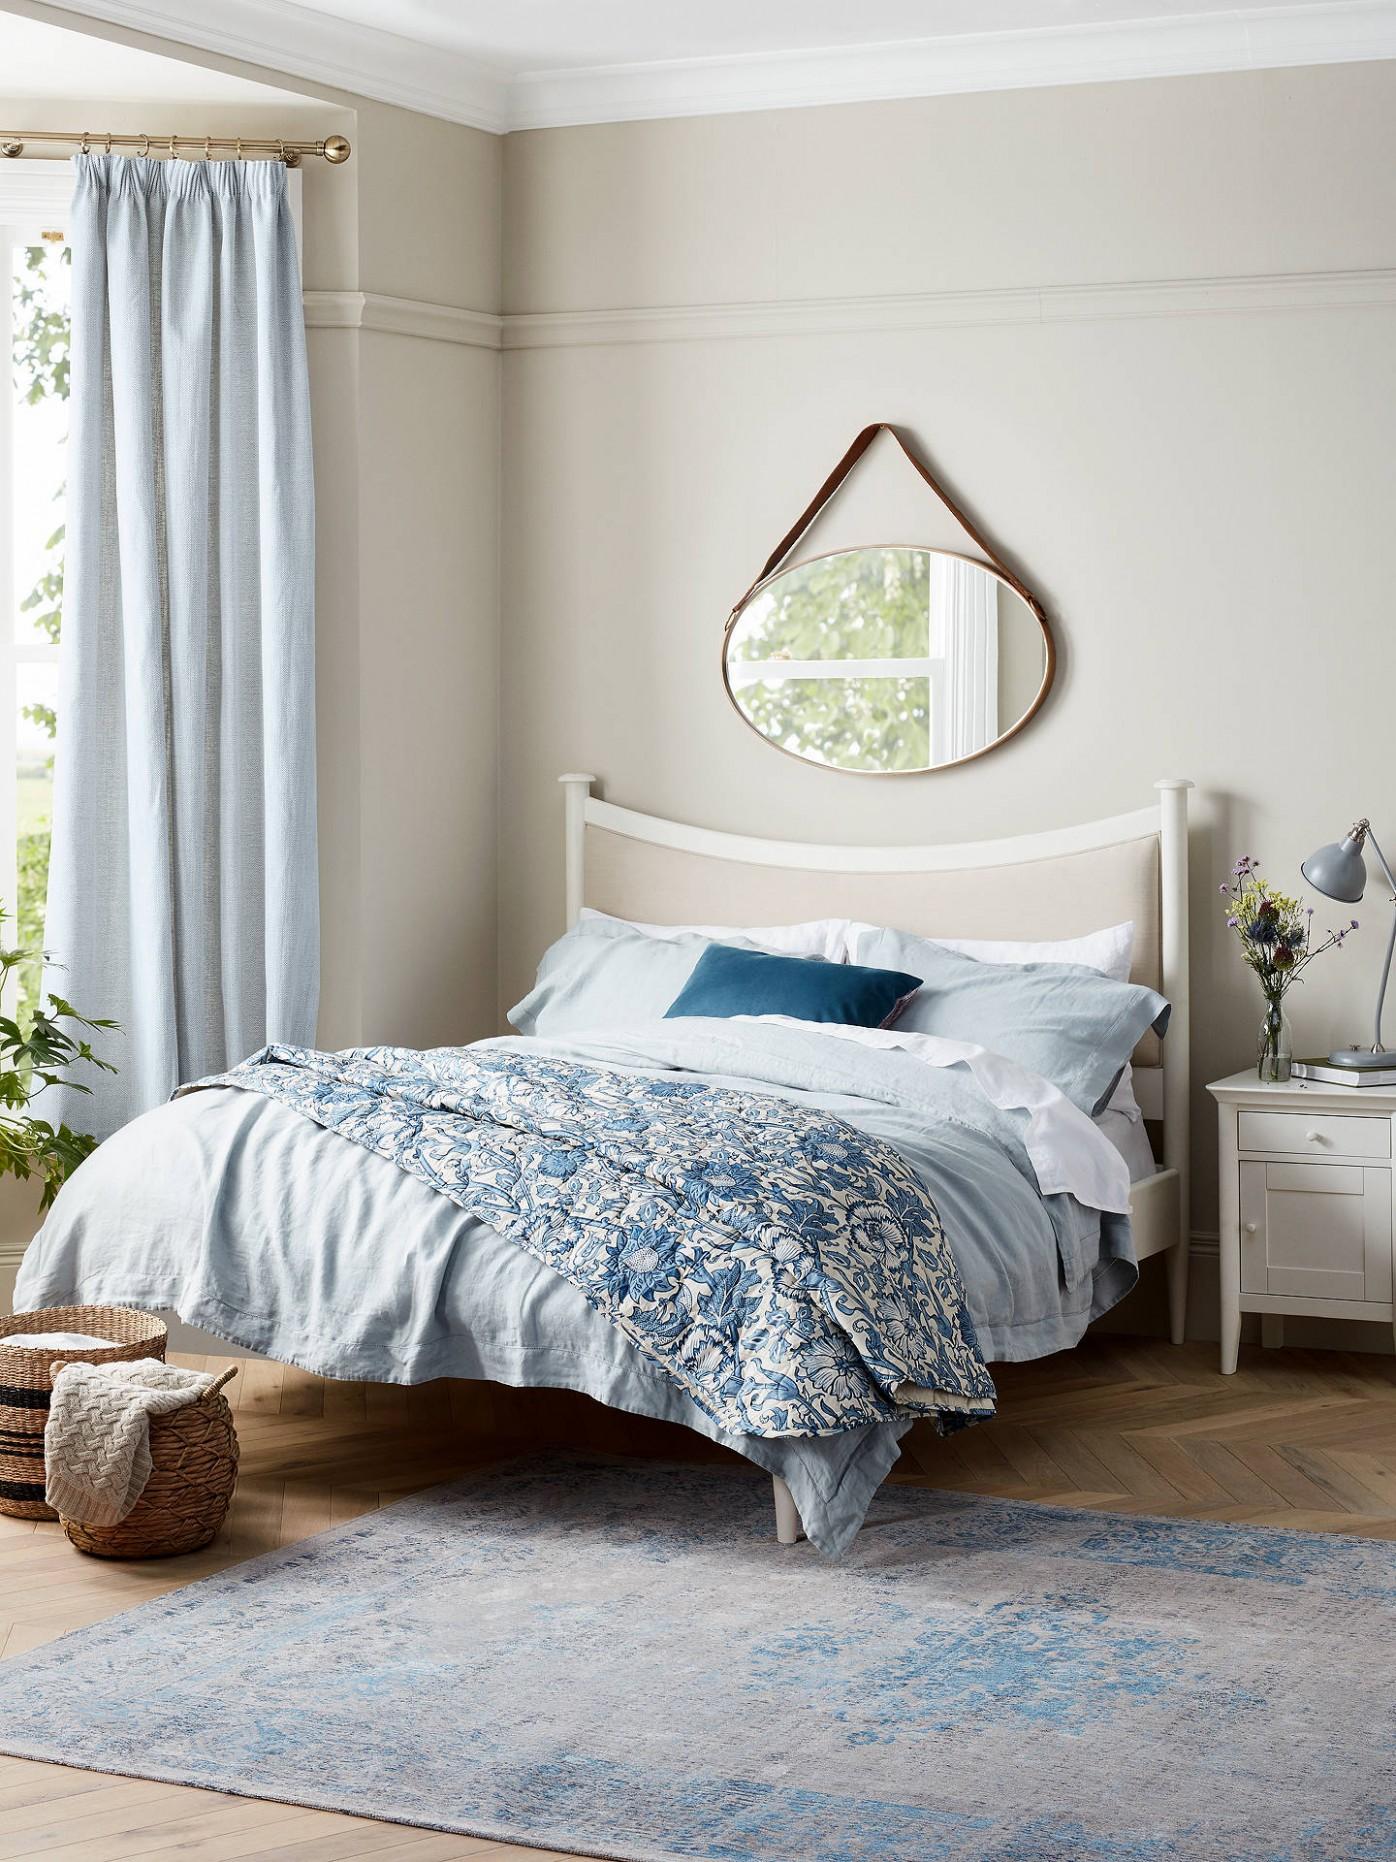 John Lewis & Partners Essence 12 Door Bedside Table, White - Bedroom Ideas John Lewis